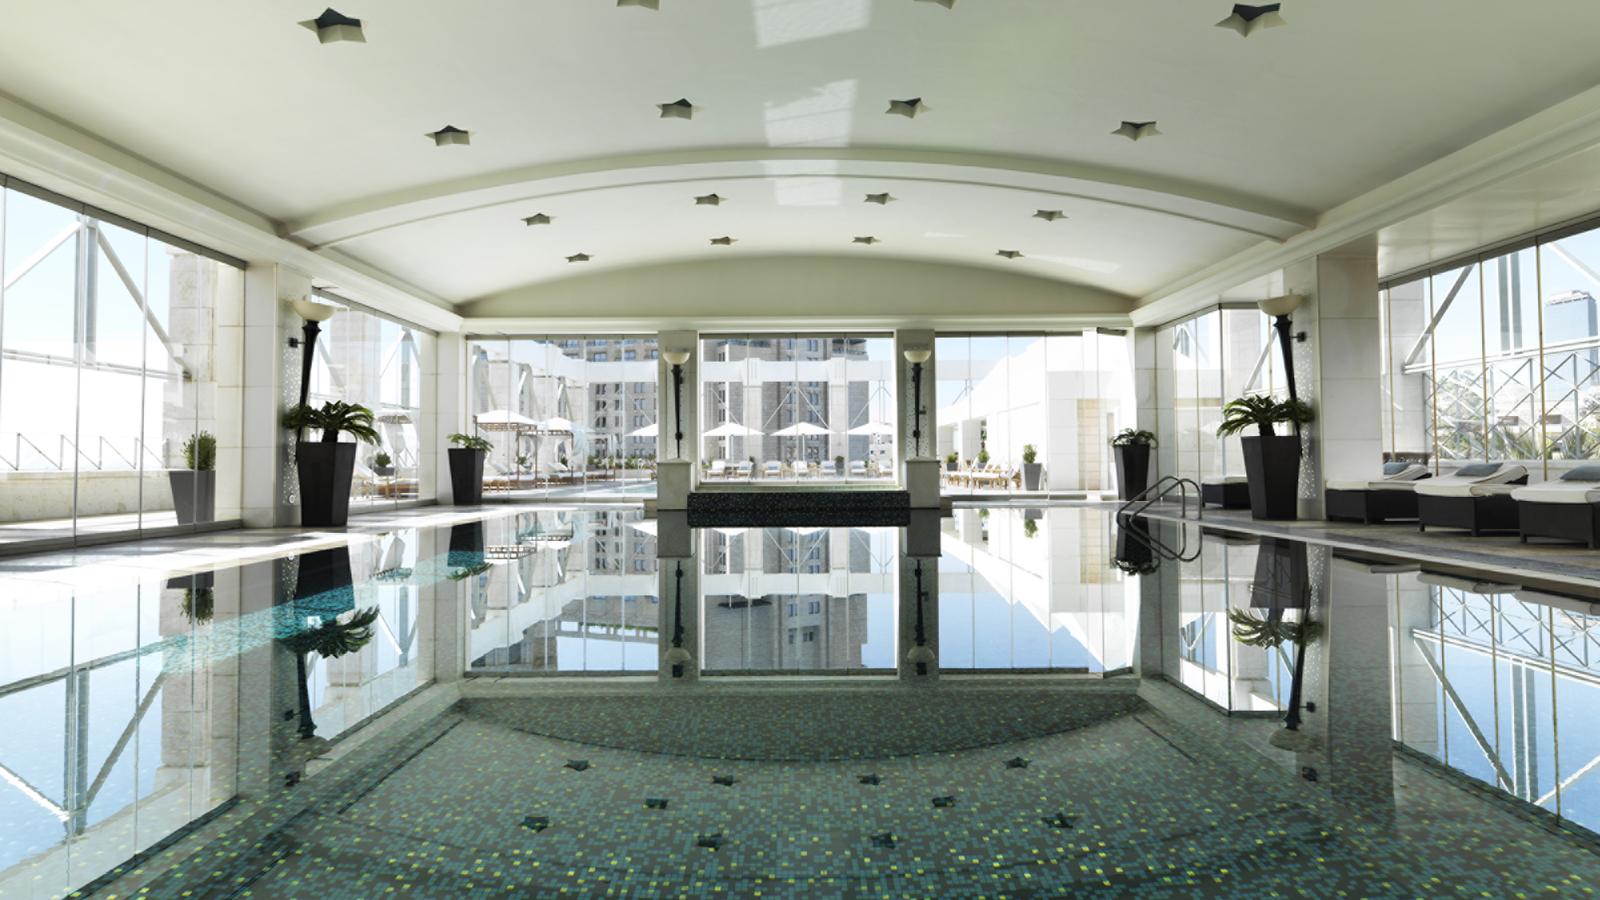 Indoor Pool Whirlpool Four Seasons Hotel Amman